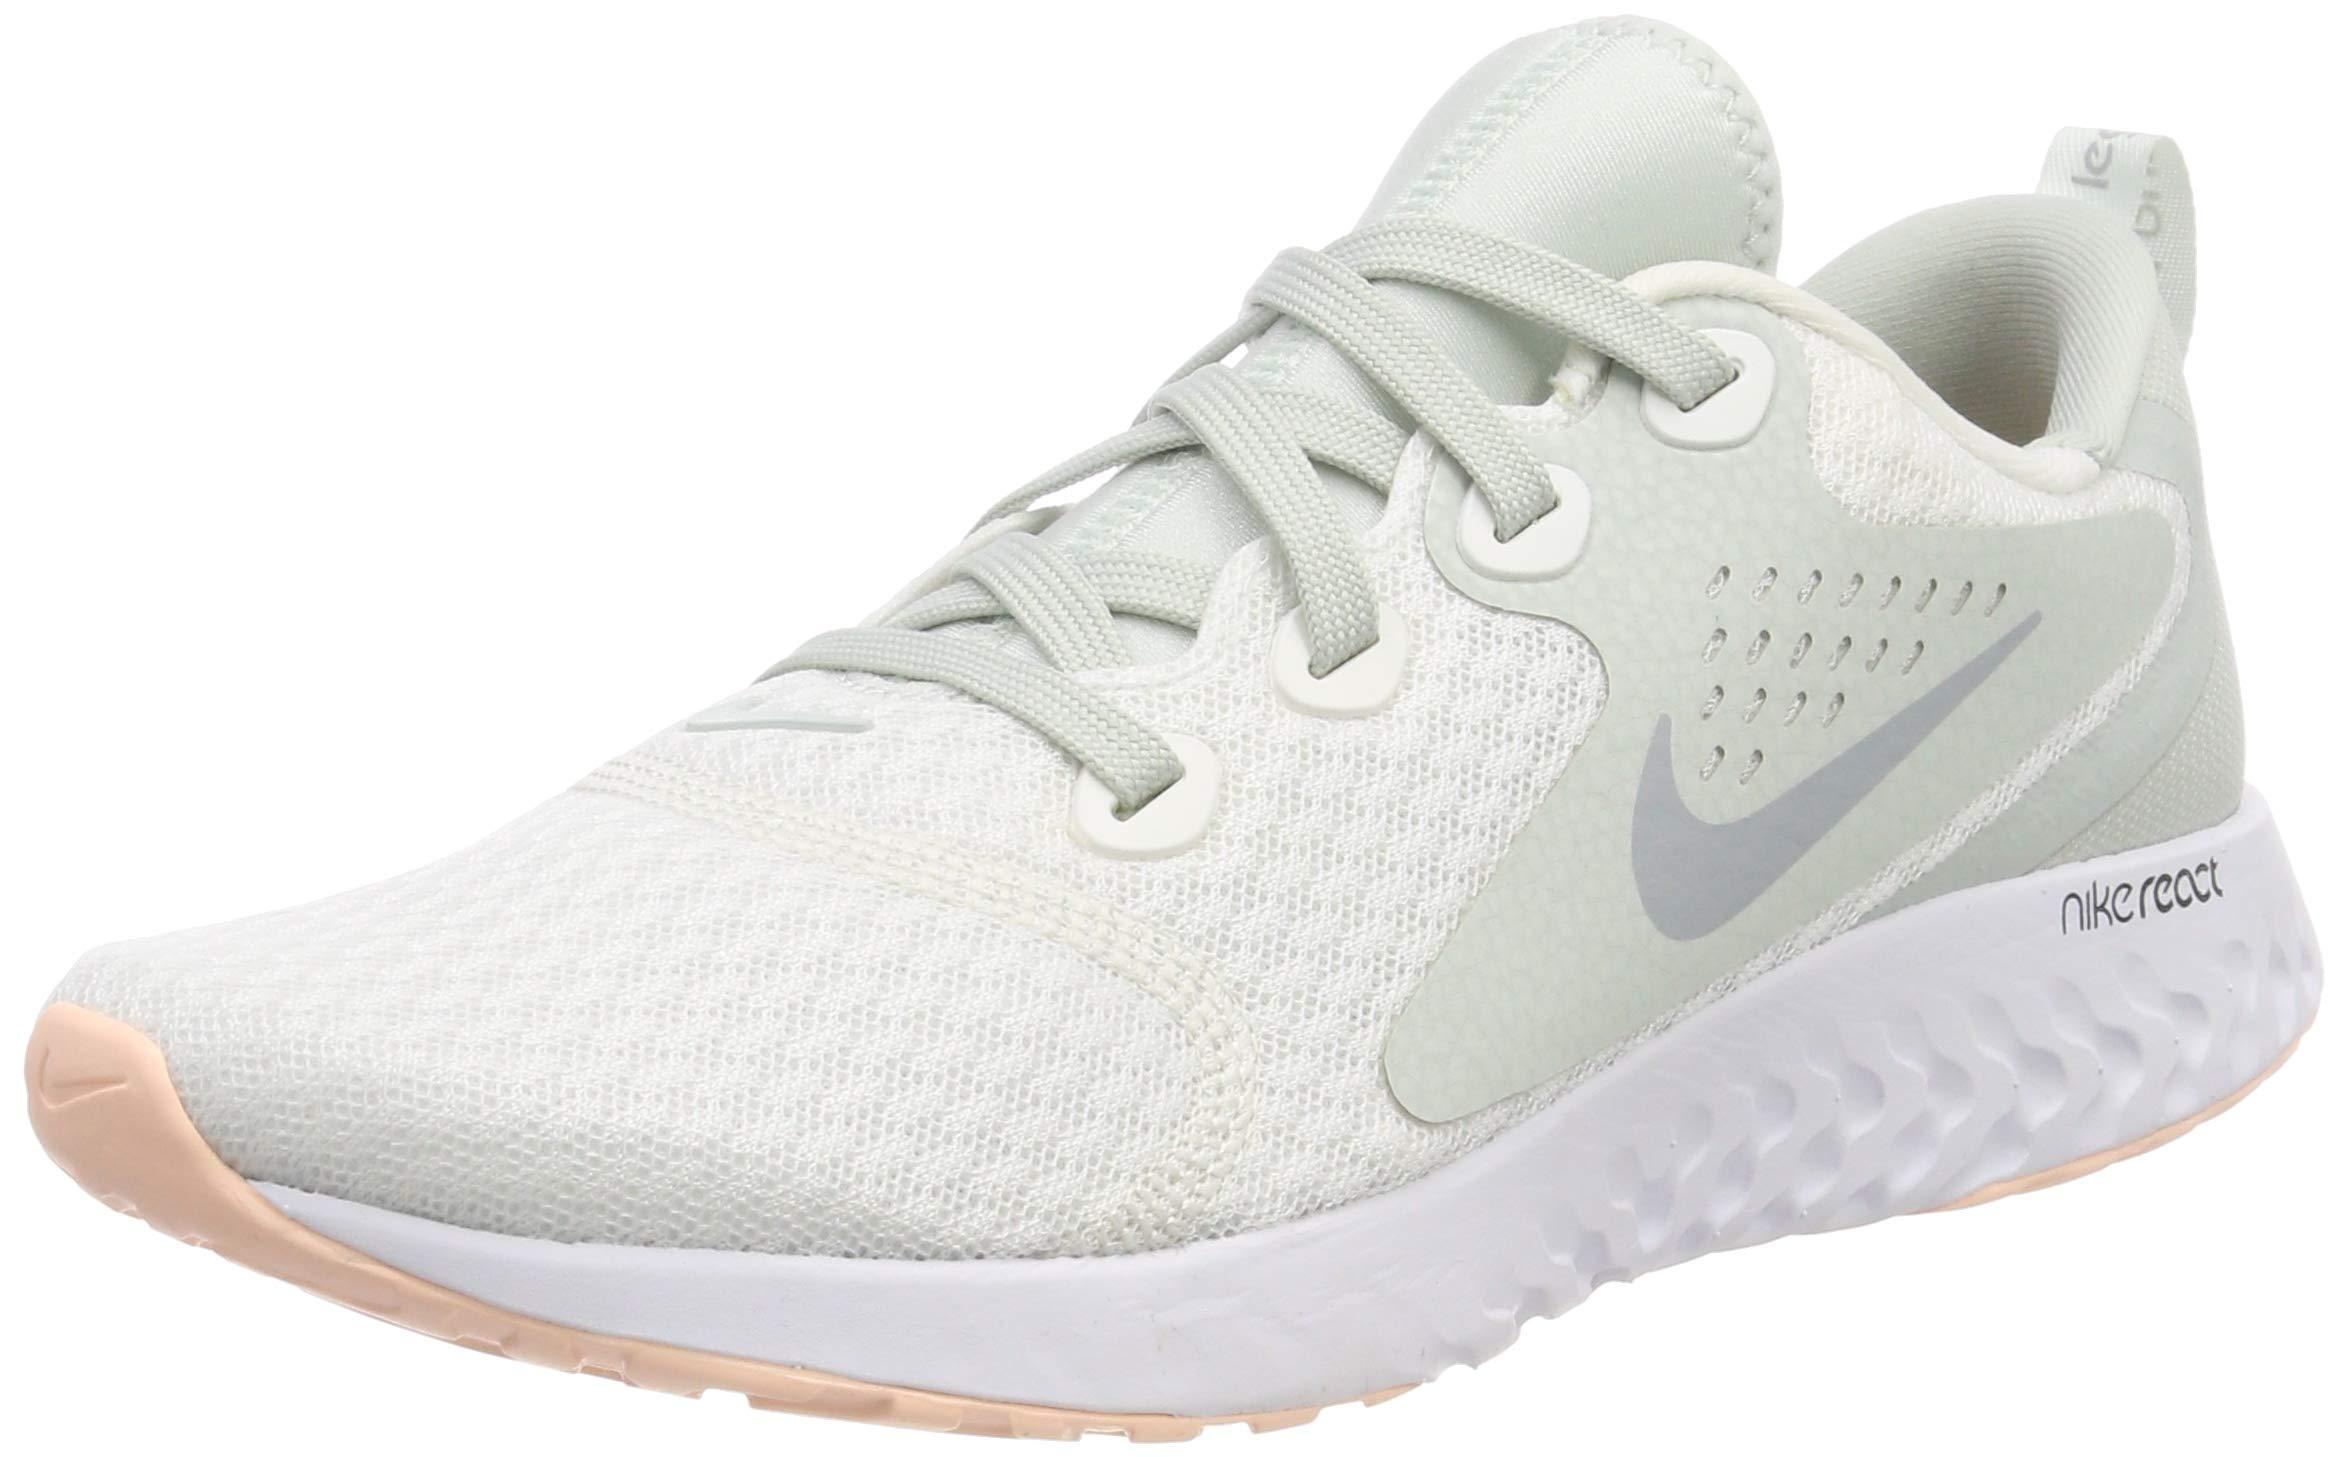 ccf740fc0822f Galleon - Nike Women's Legend React Low-Top, Summit White/Wolf Grey/Light  Silver, US 8.5